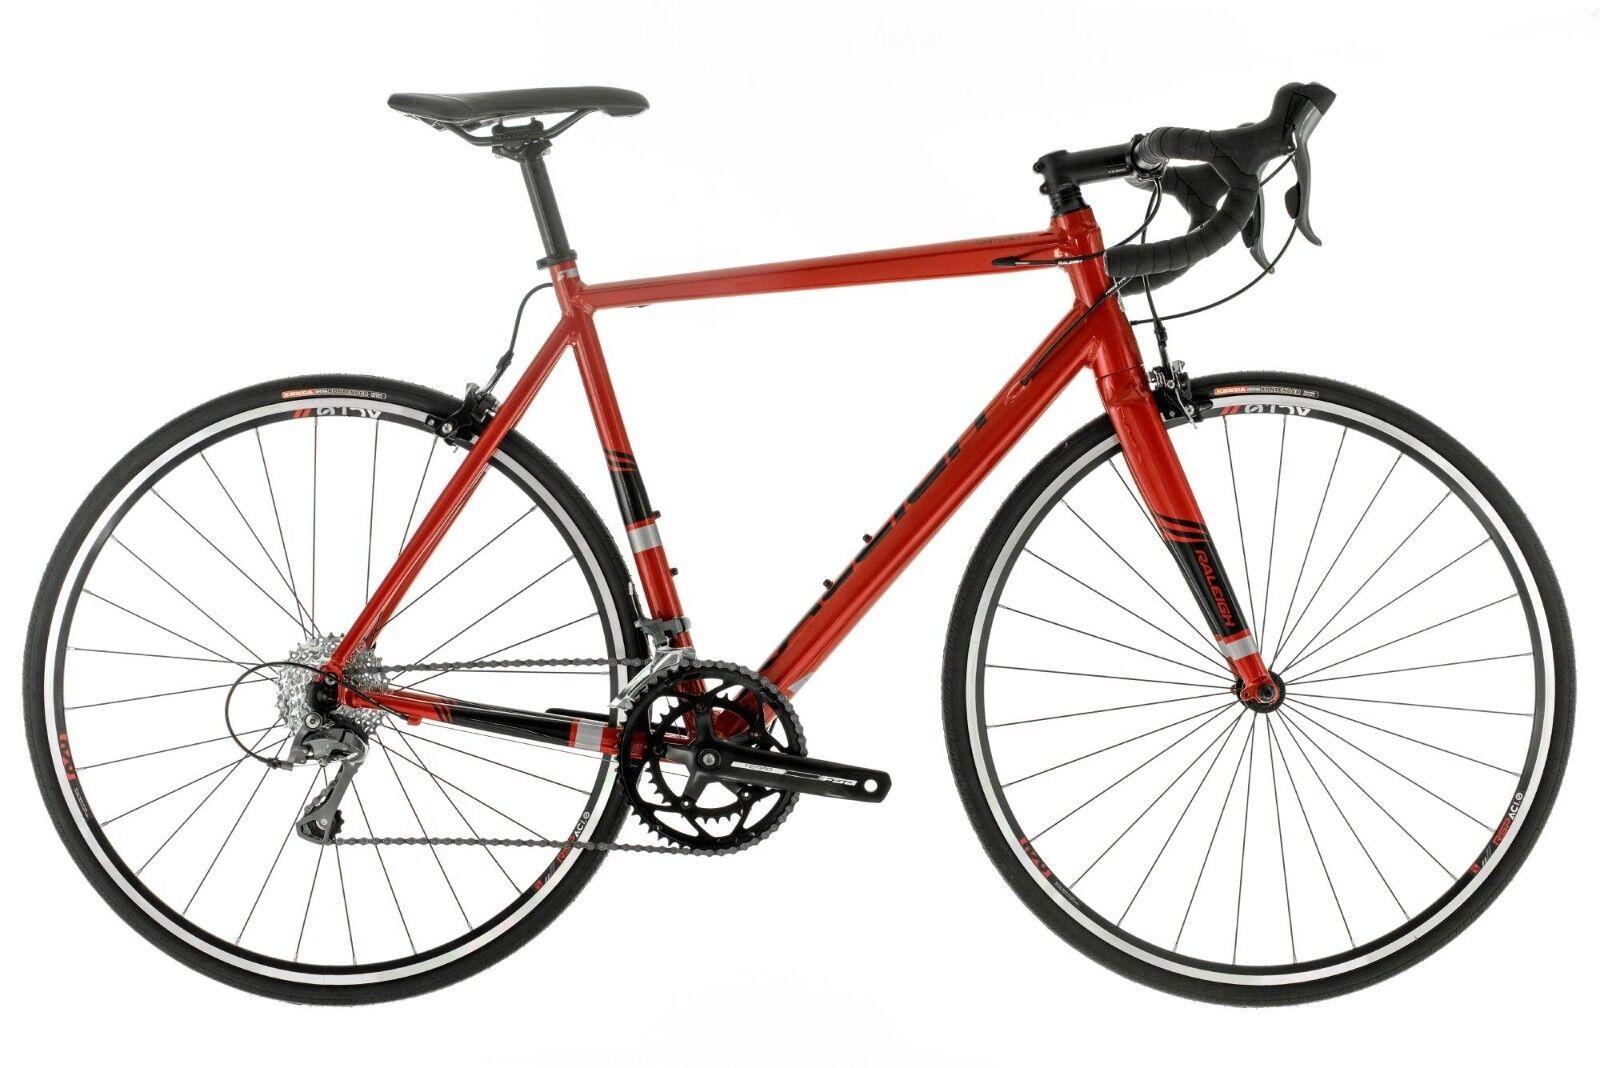 58cm Raleigh Criteriun Road Bike (RRP )